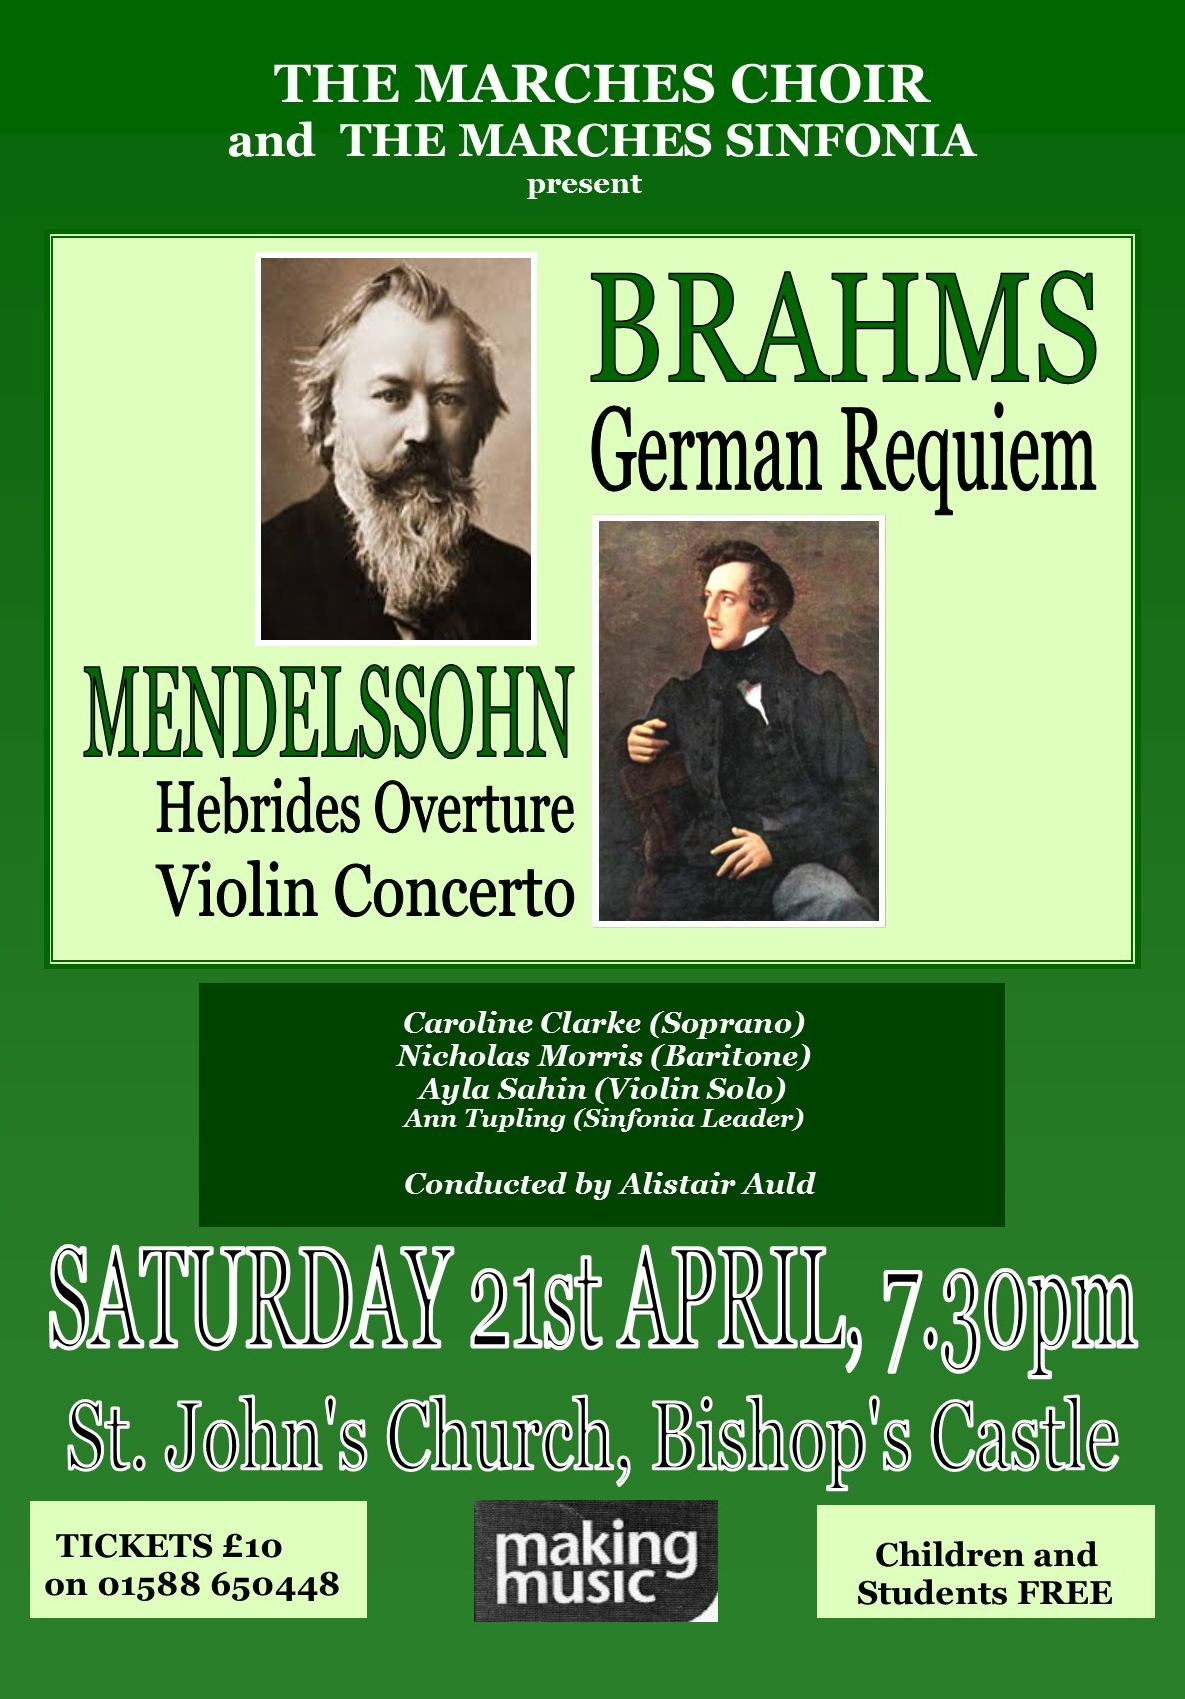 Marches Choir Brahms German Requiem April 18.jpg